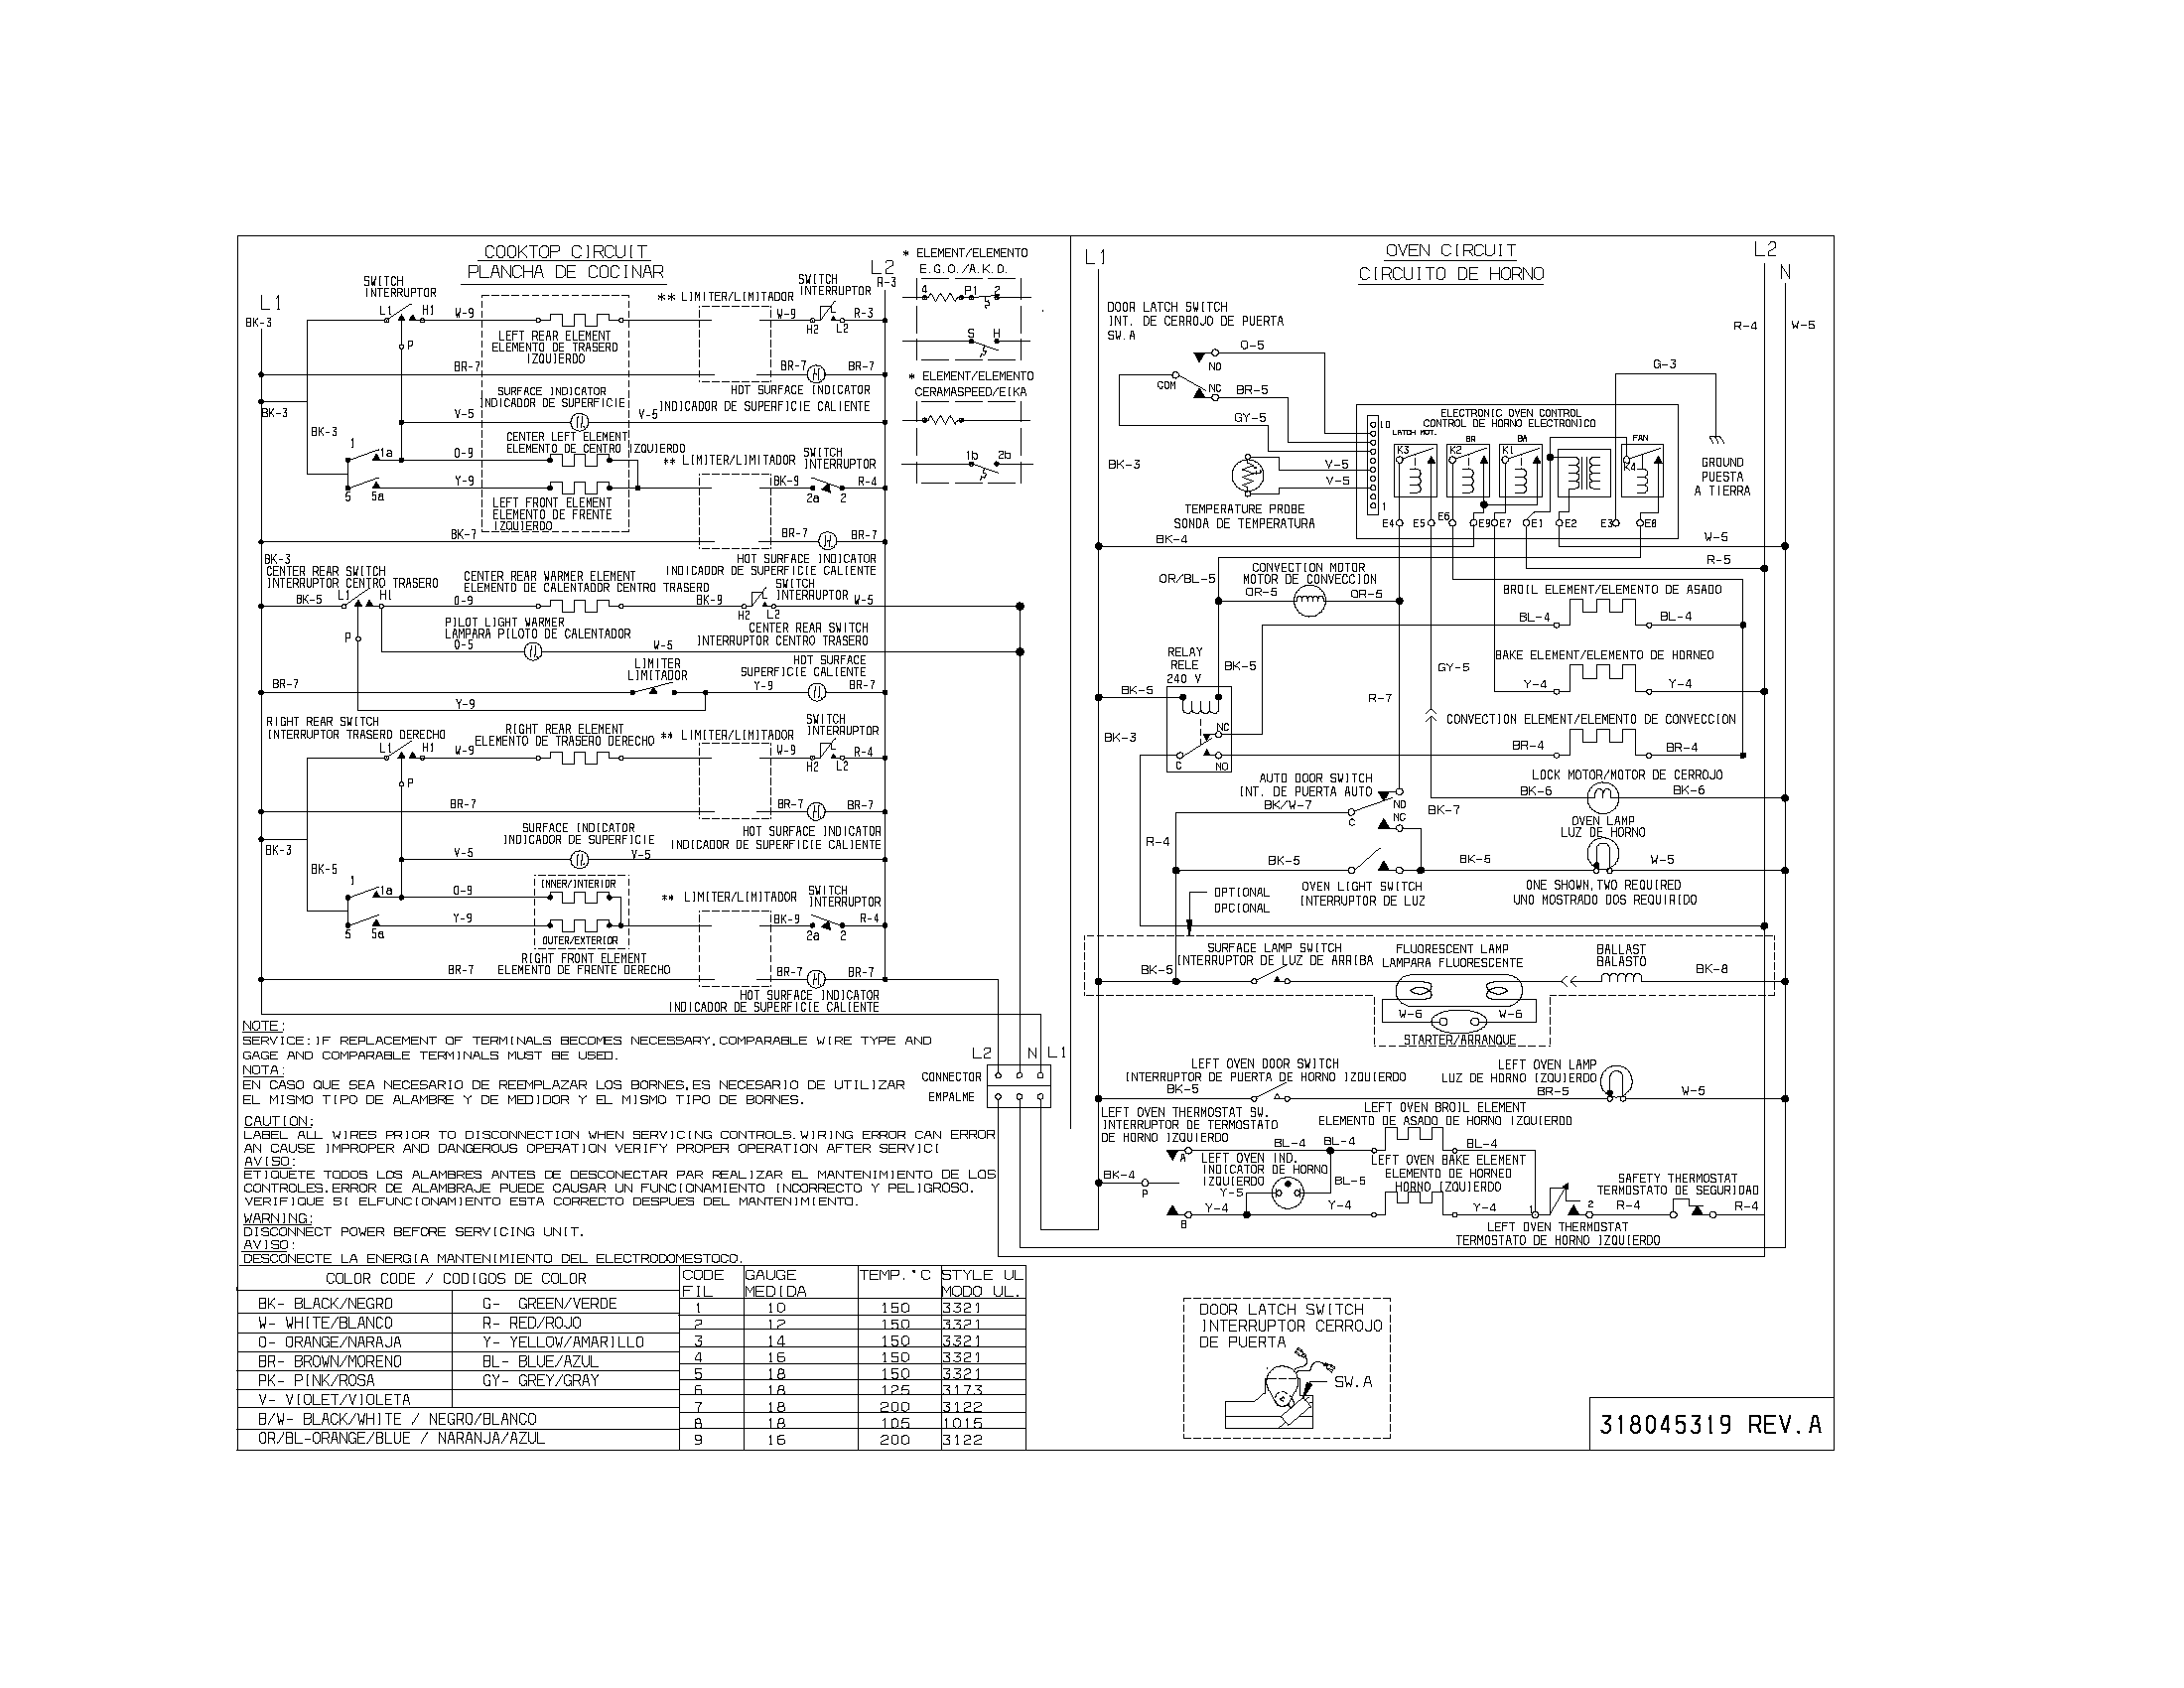 Kic fridge thermostat wiring diagram kic fridge thermostat wiring diagram efcaviationcom asfbconference2016 Image collections